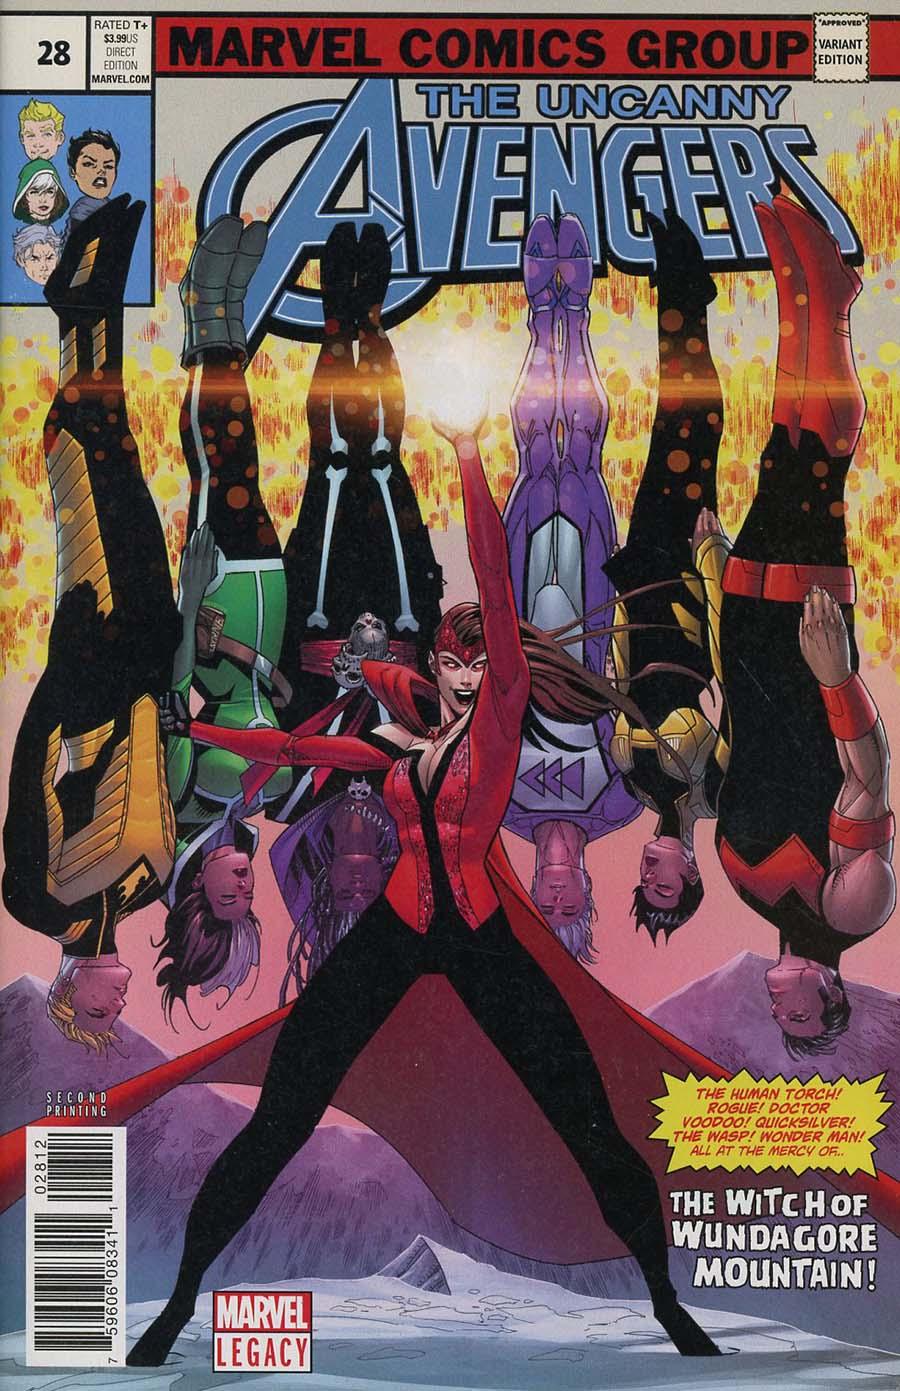 Uncanny Avengers Vol 3 #28 Cover E 2nd Ptg Variant Jon Malin Cover (Marvel Legacy Tie-In)